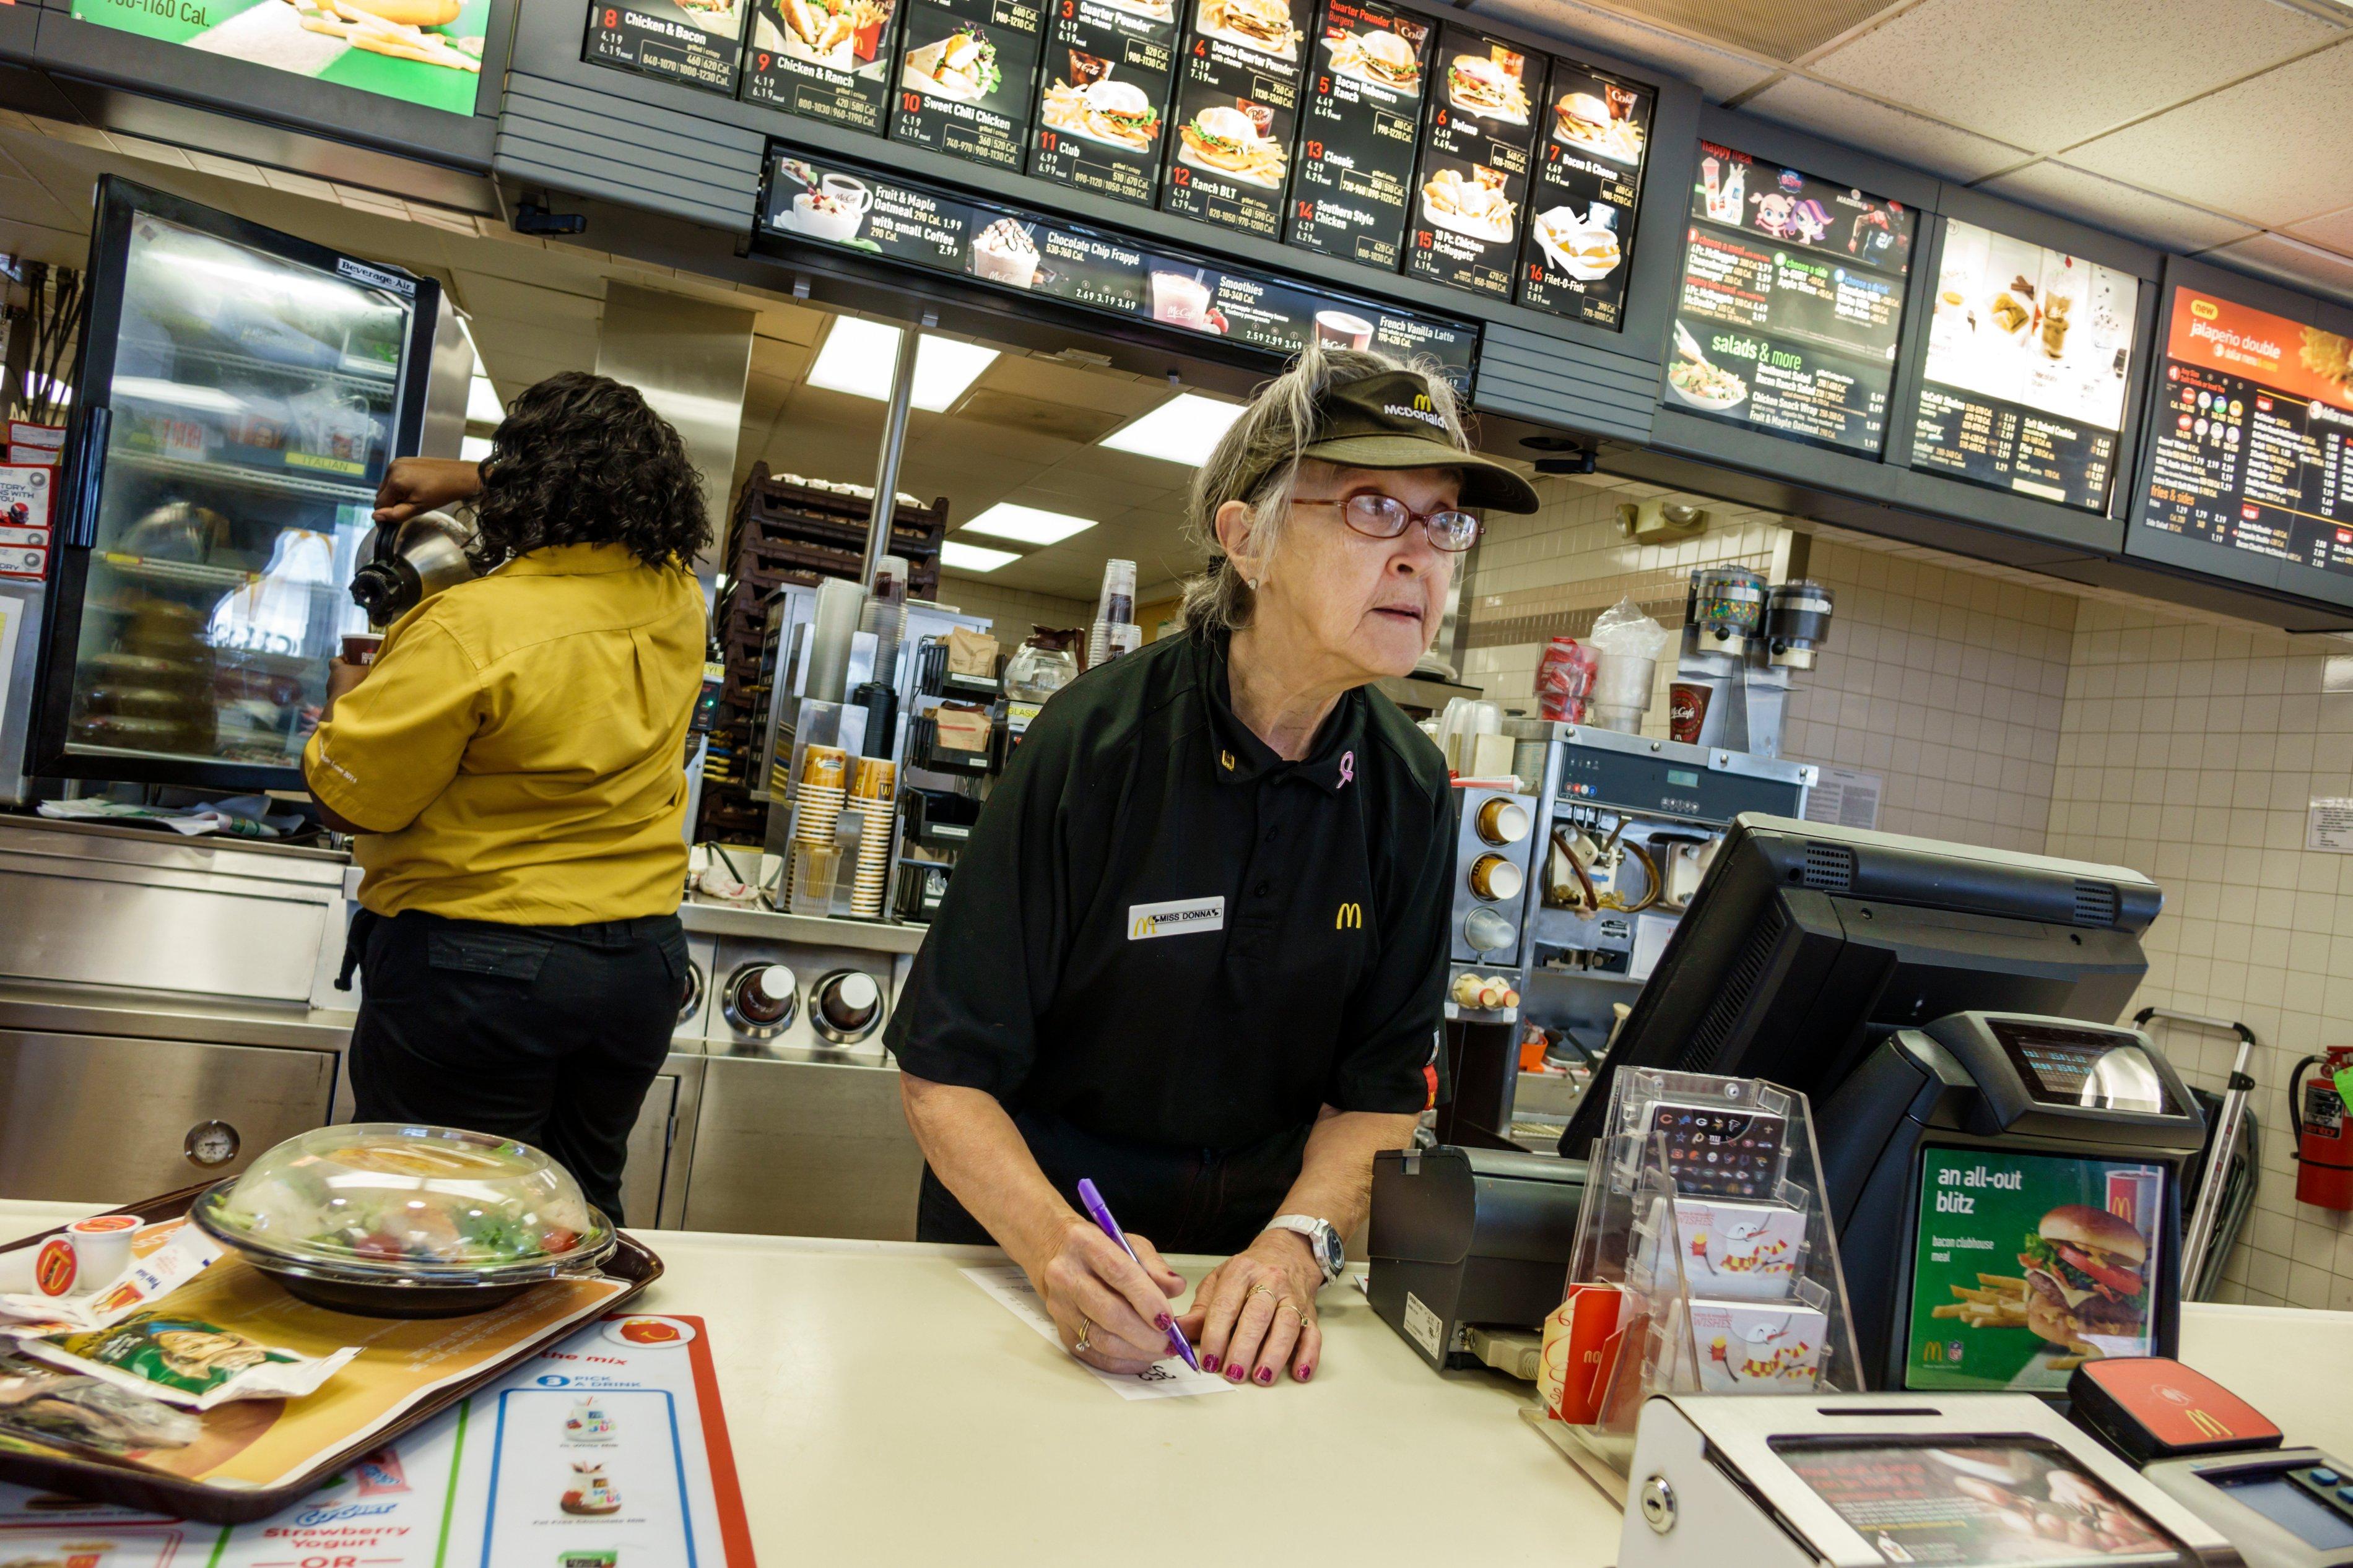 senior woman working at mcdonalds